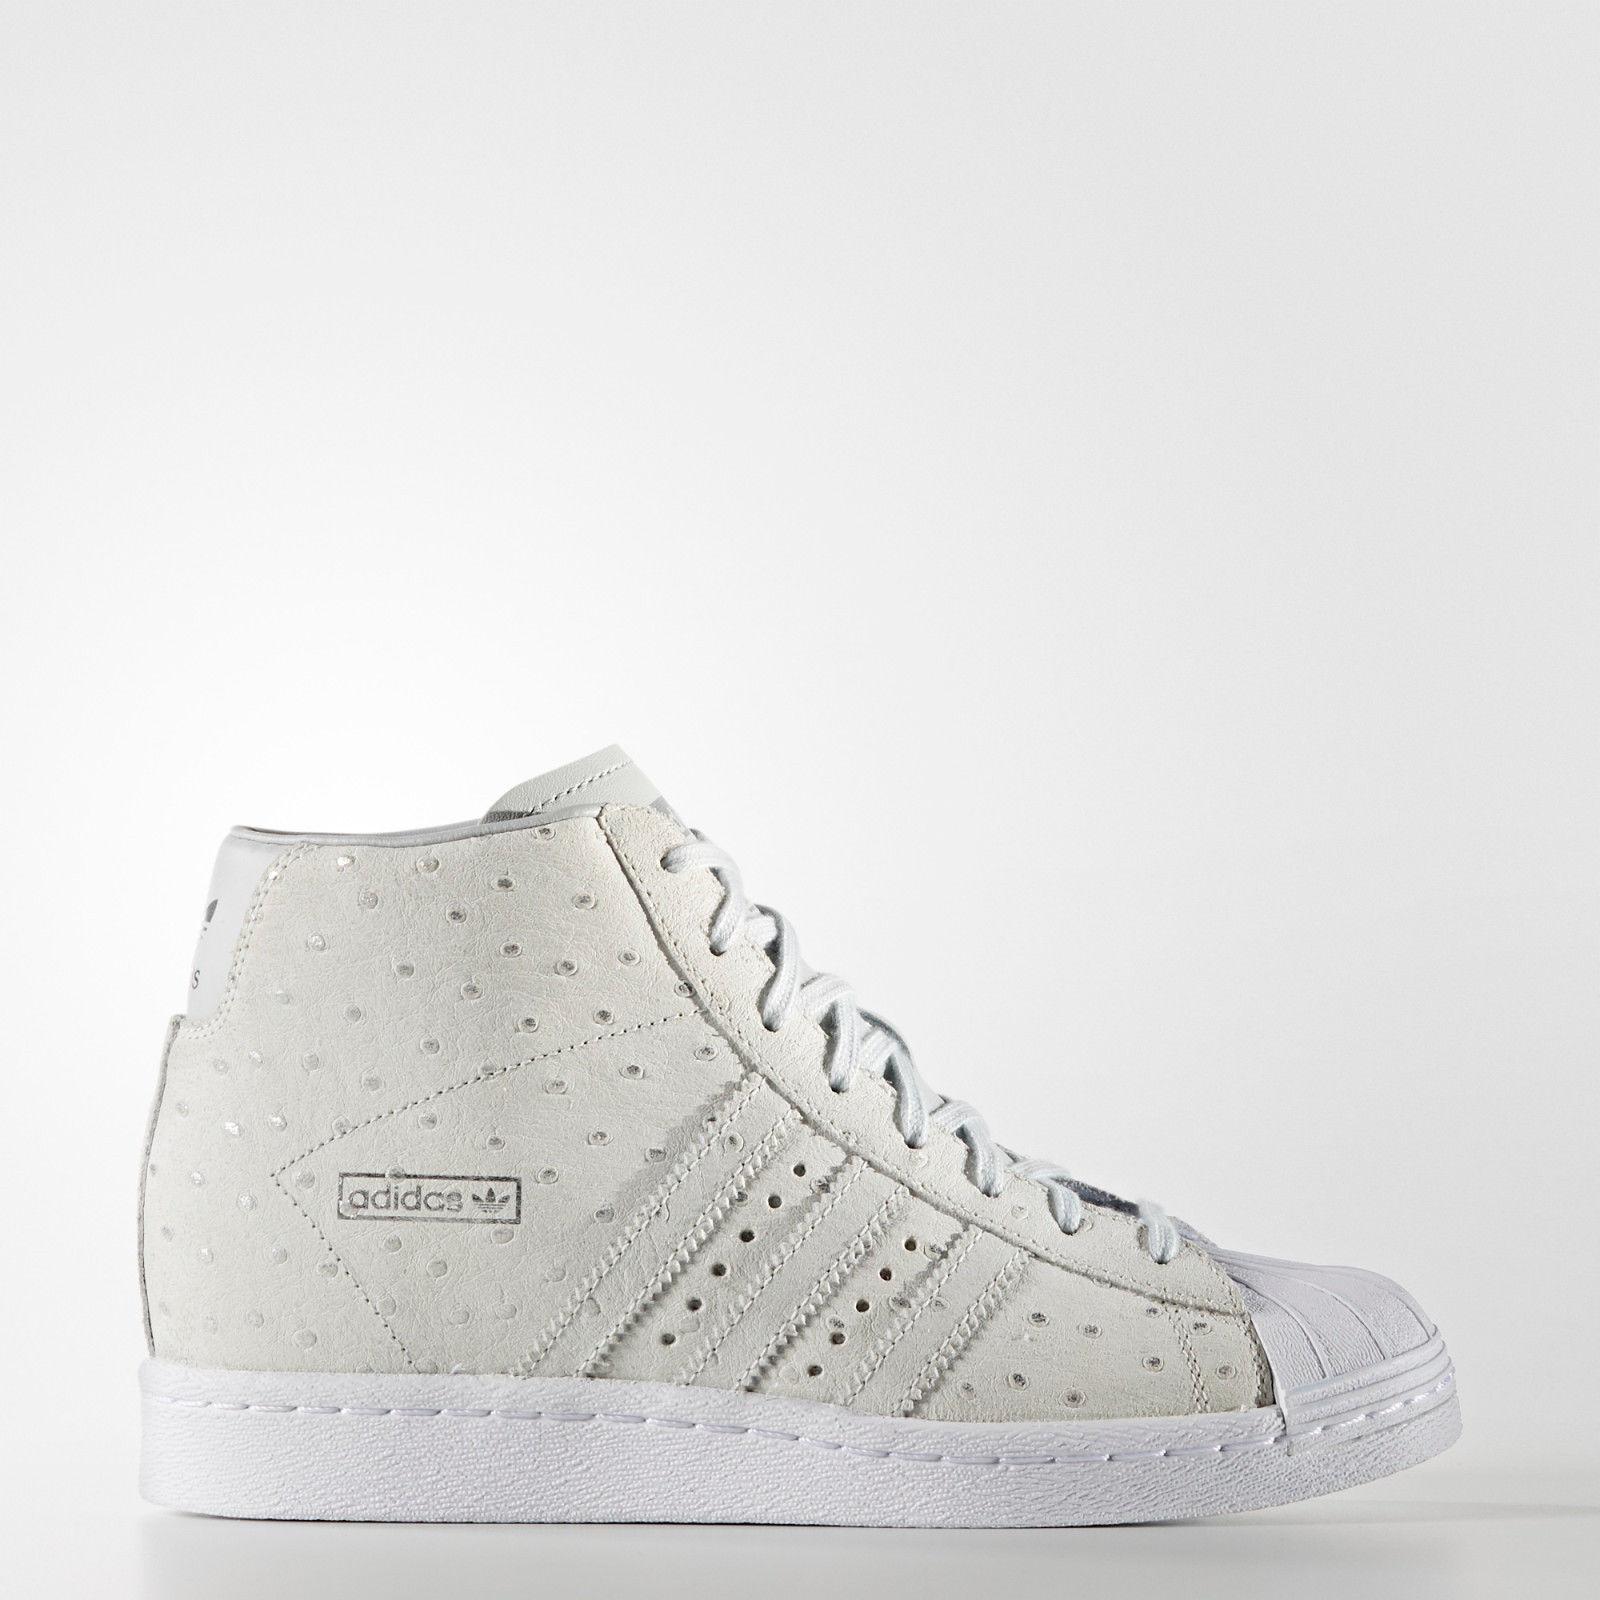 Adidas Originals Superstar Up Wedge S76406 Women's Gray Beige Rita Ora Rare